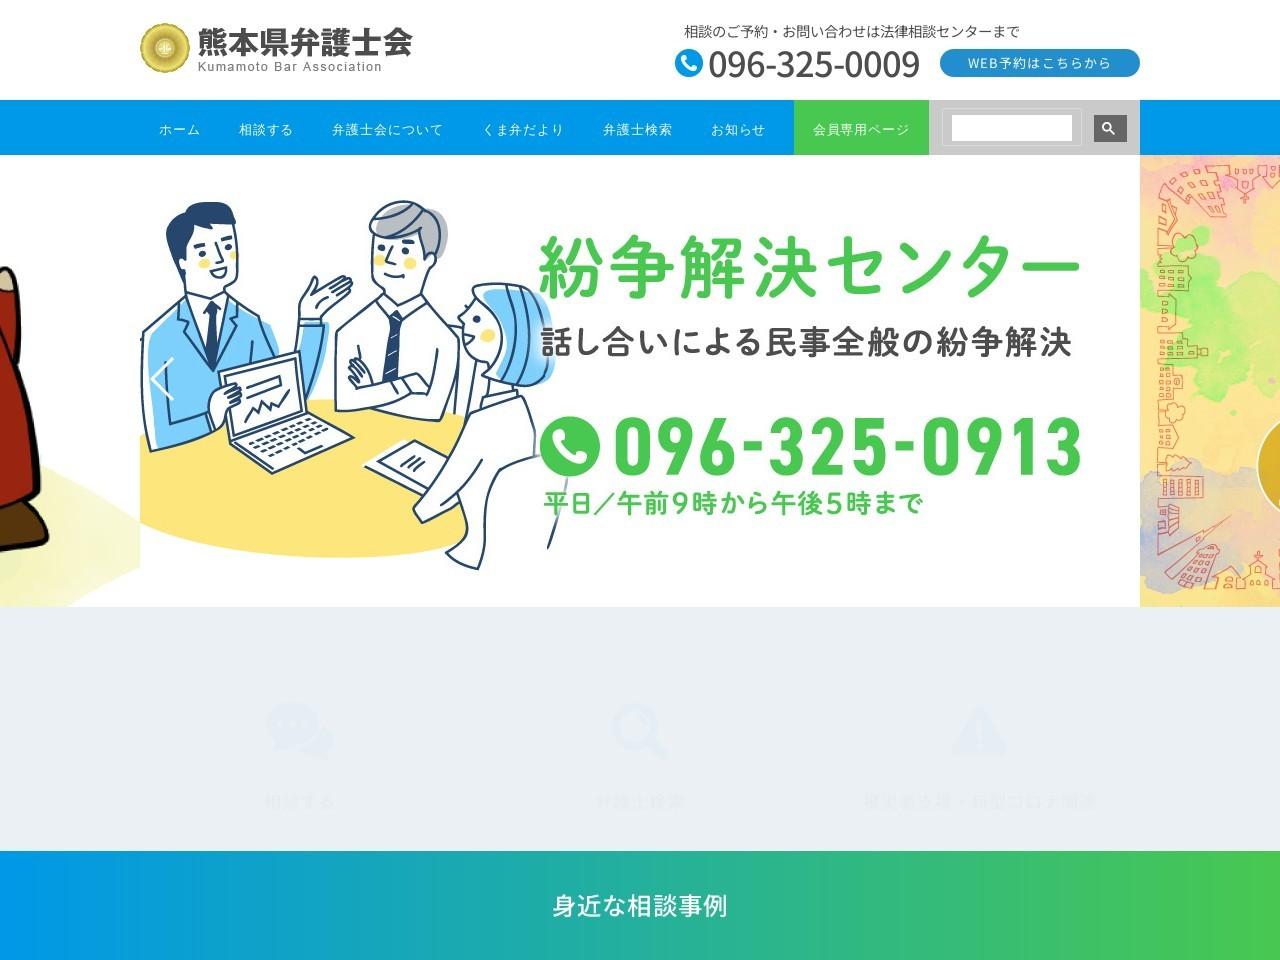 熊本県弁護士会法律相談センター